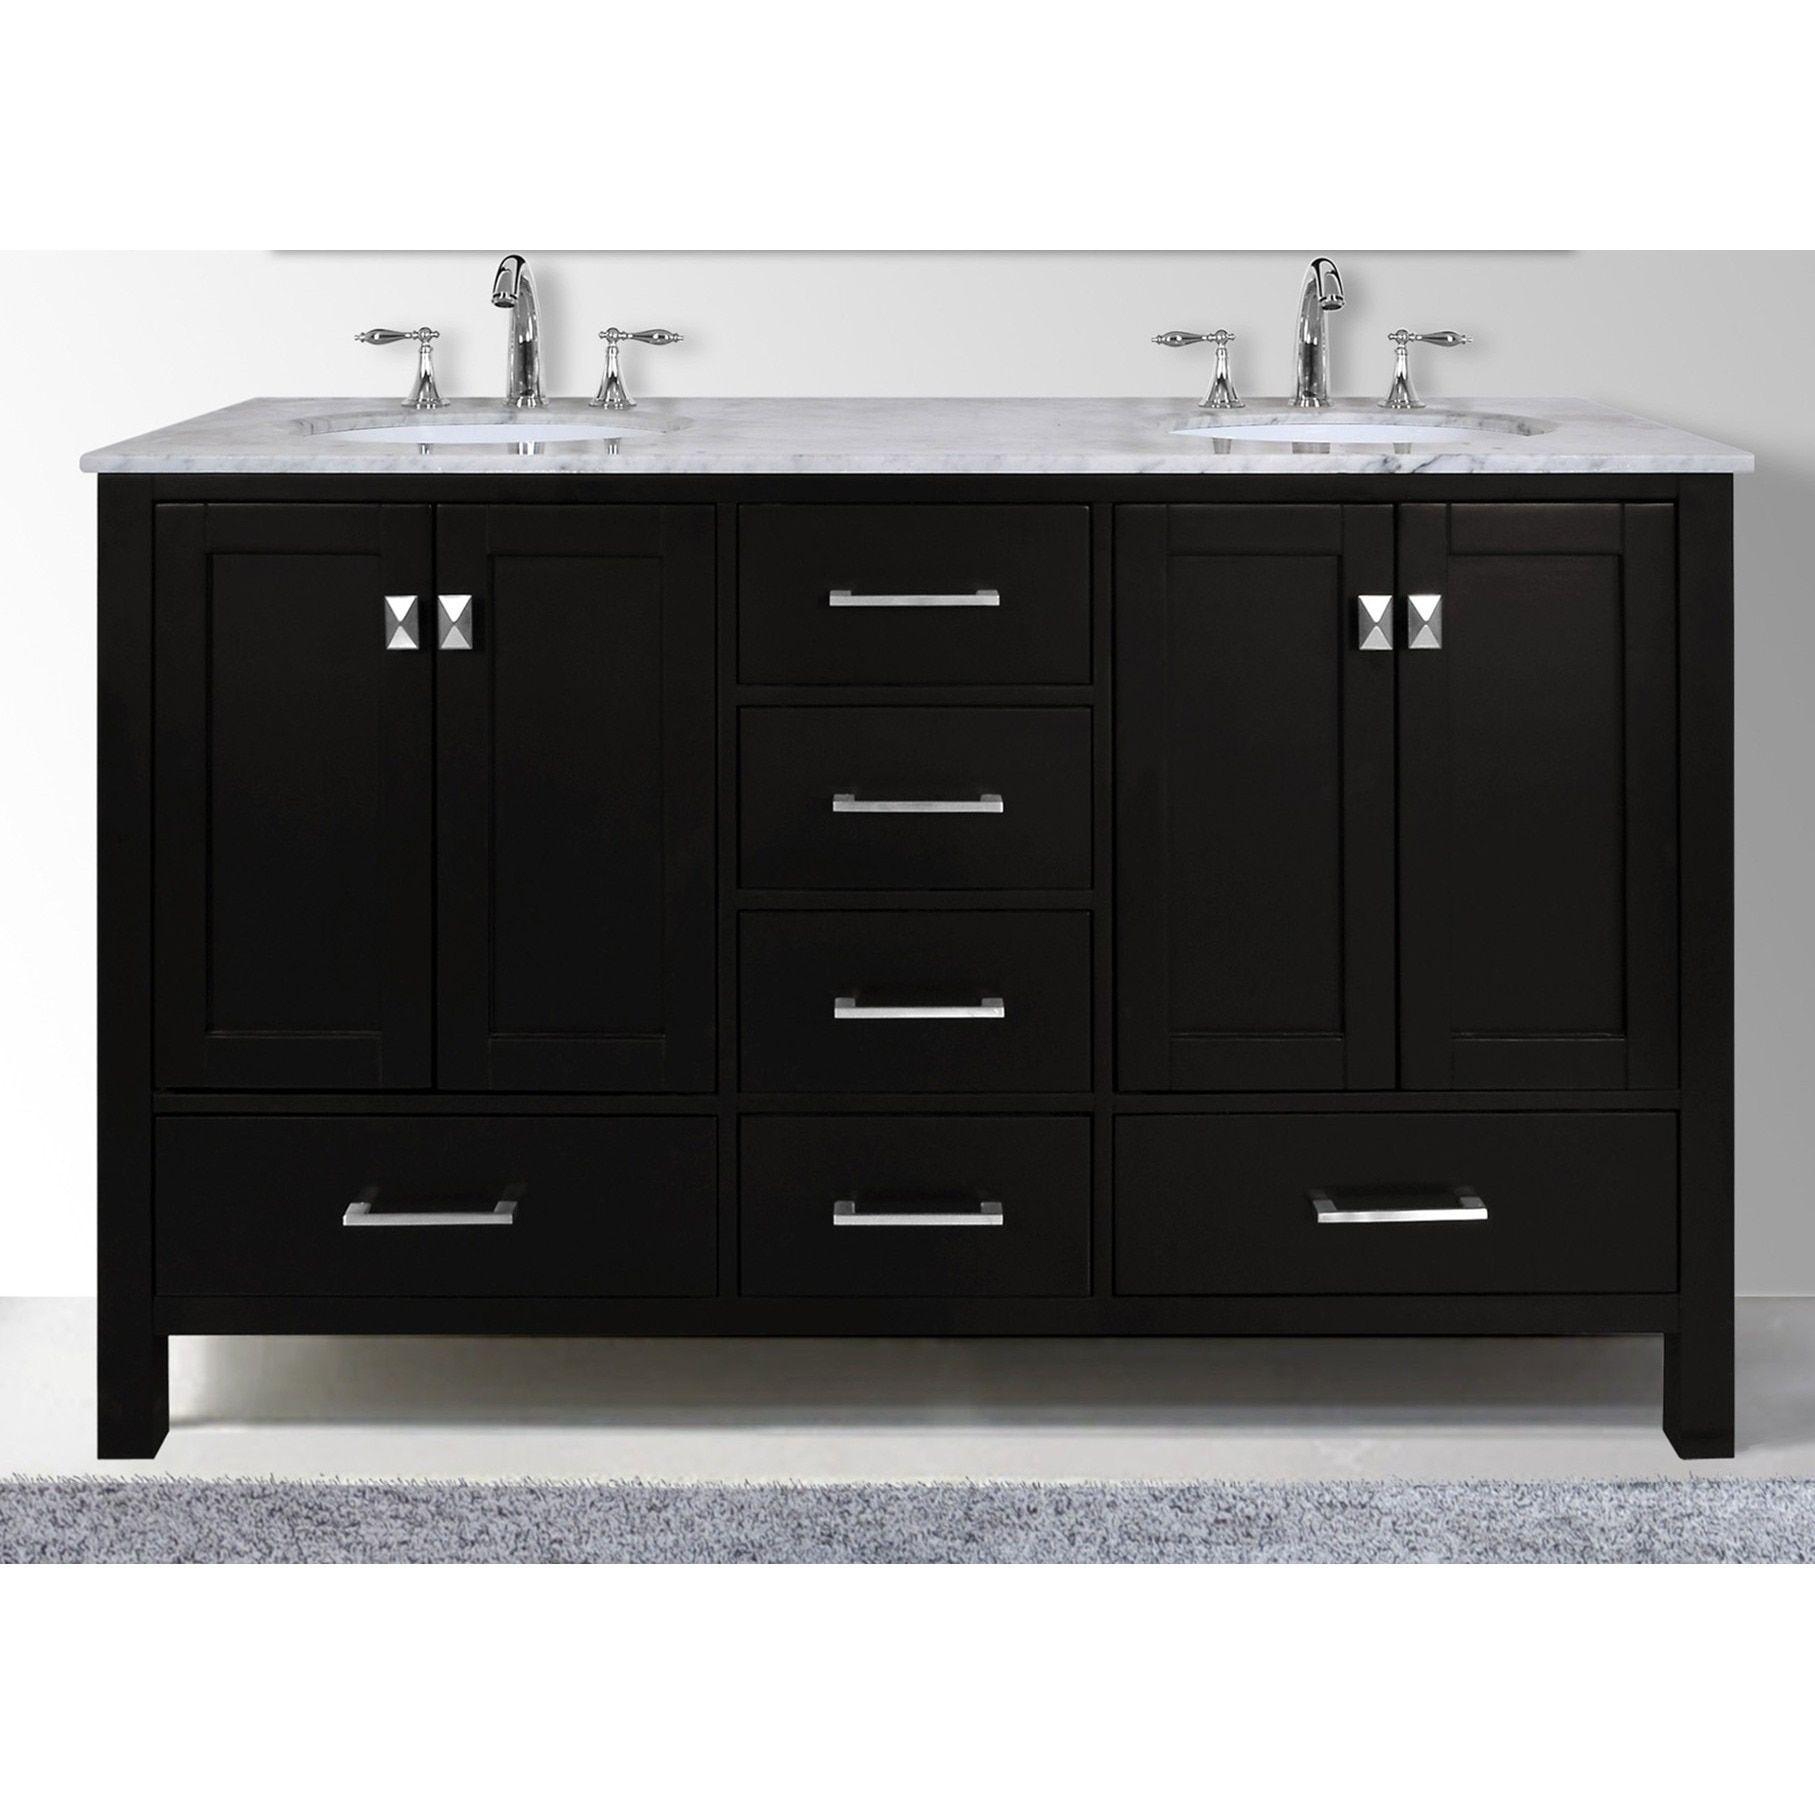 Stufurhome 60 Inch Malibu Espresso Double Sink Bathroom Vanity With Carrara Marble Top